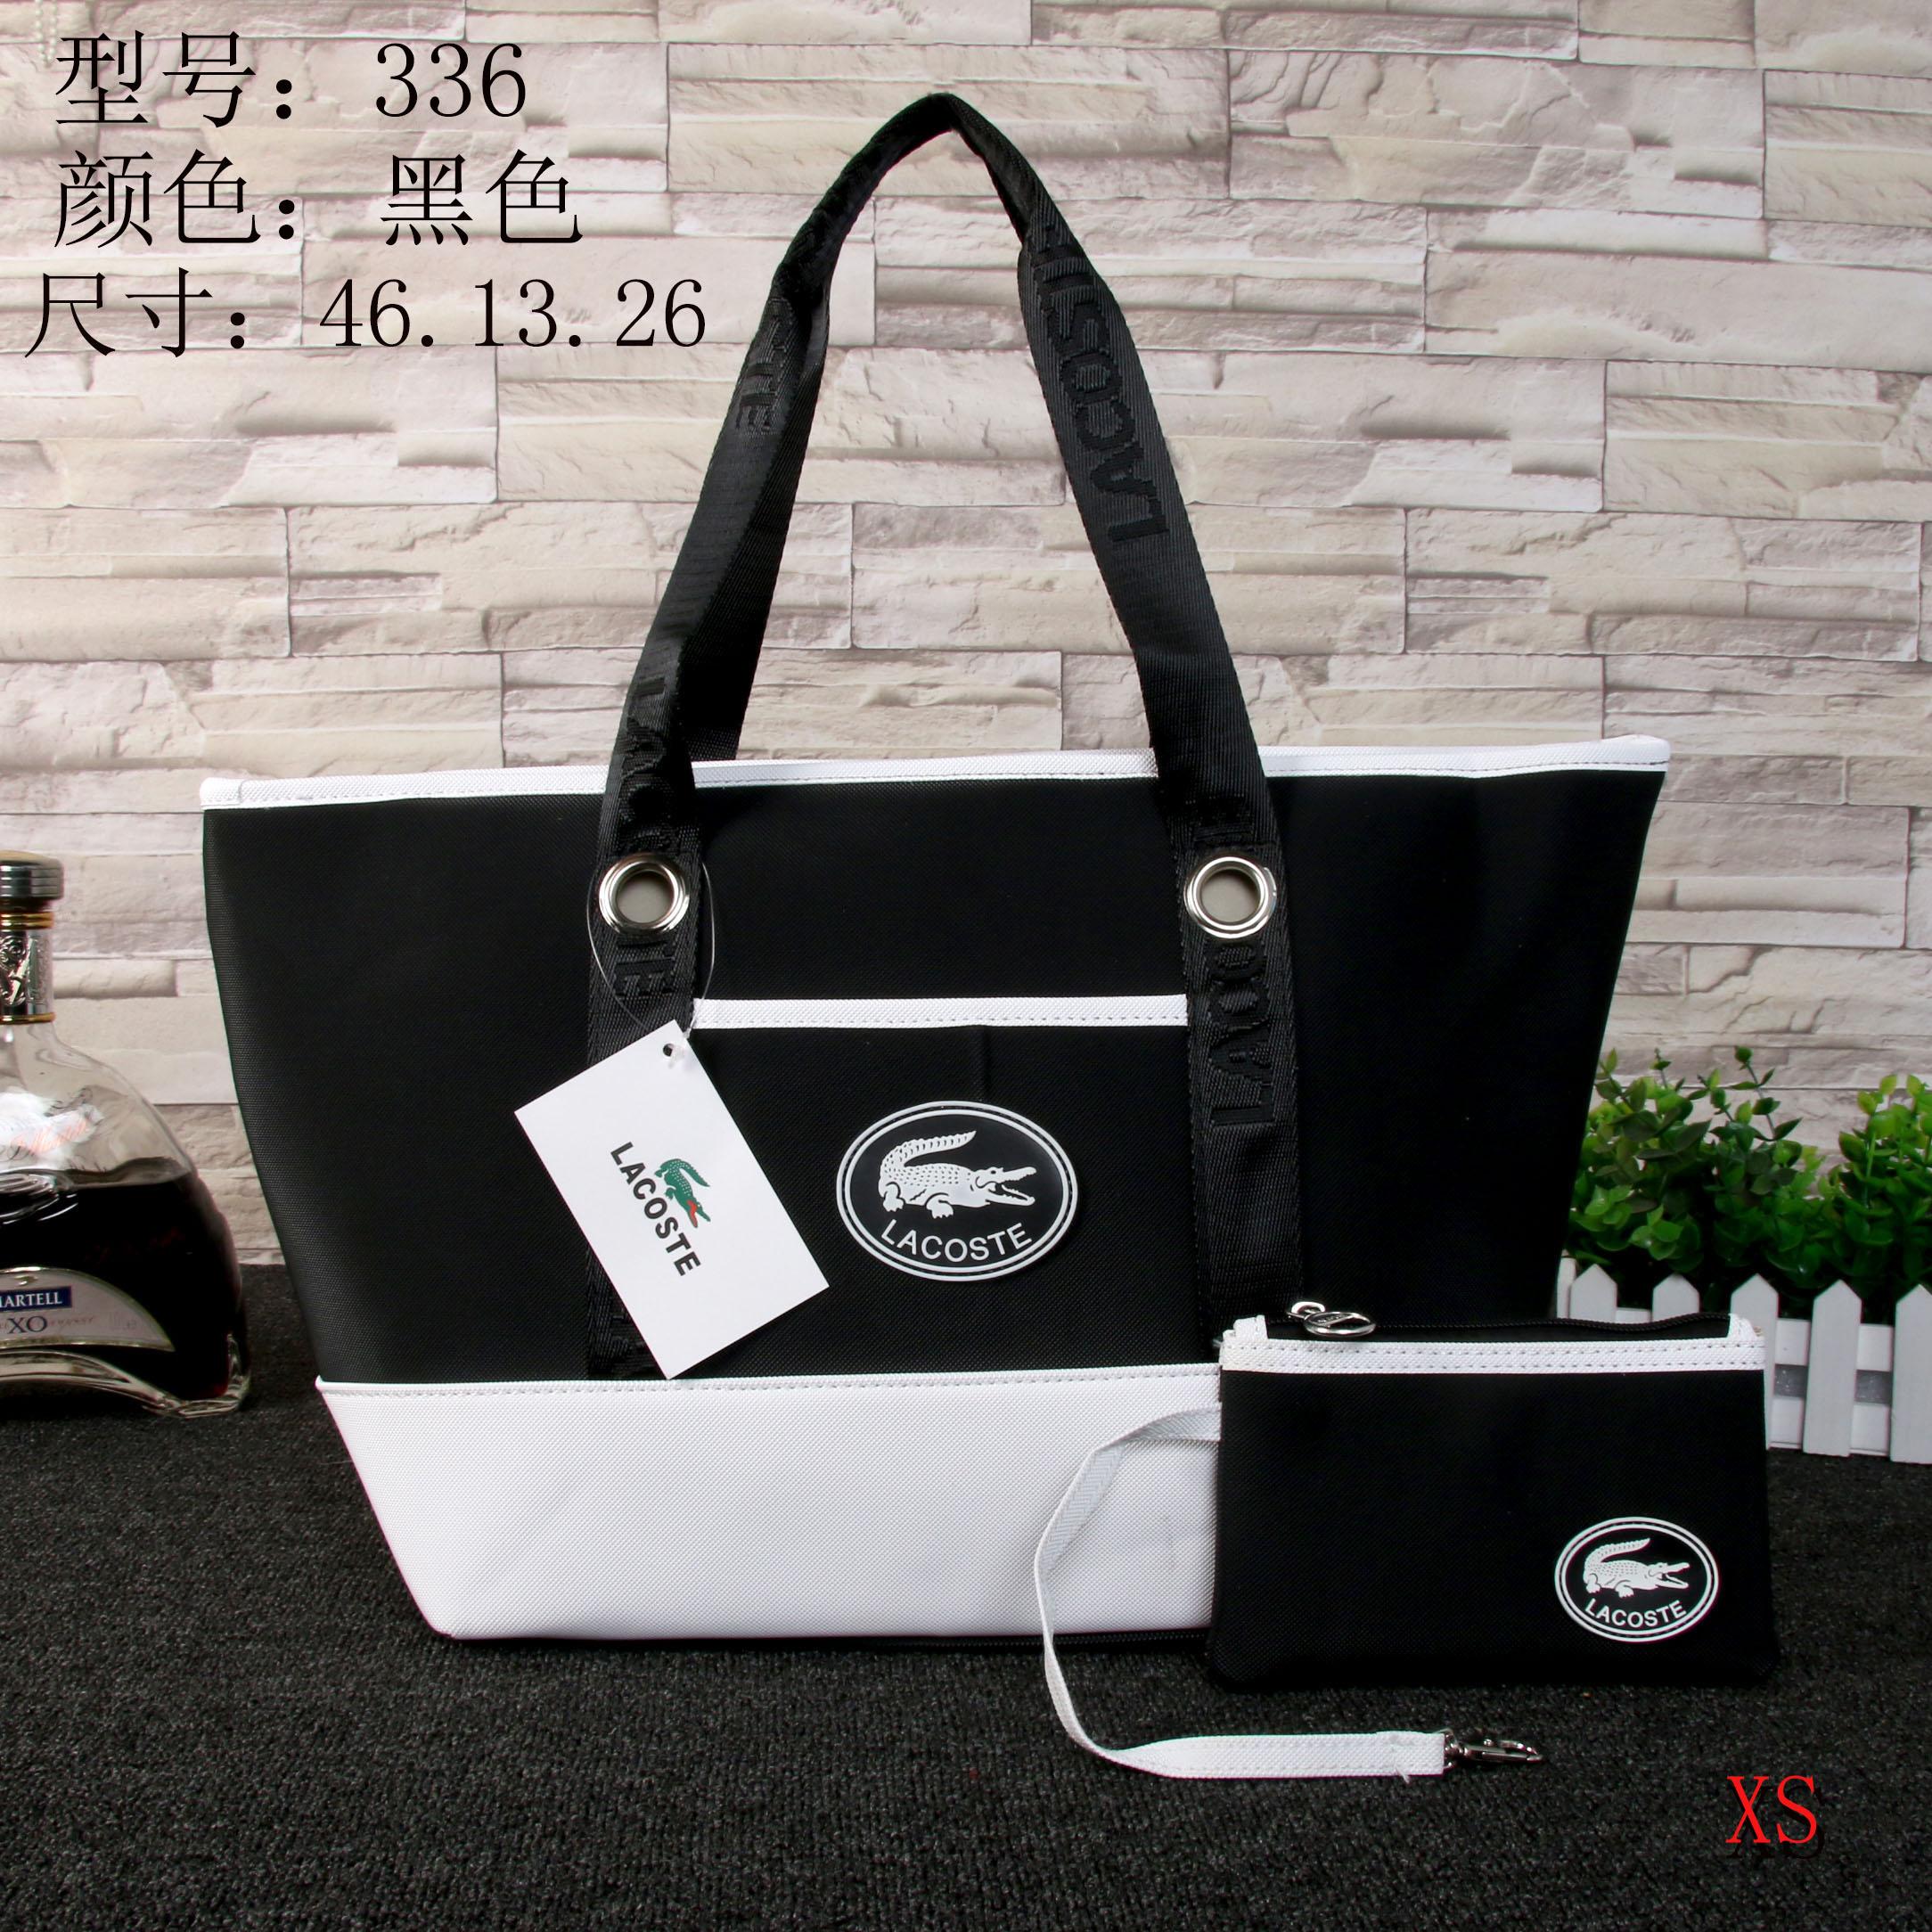 $35 cheap LACOSTE Handbags #213166 - [GT213166] free shipping | Replica LACOSTE Handbags